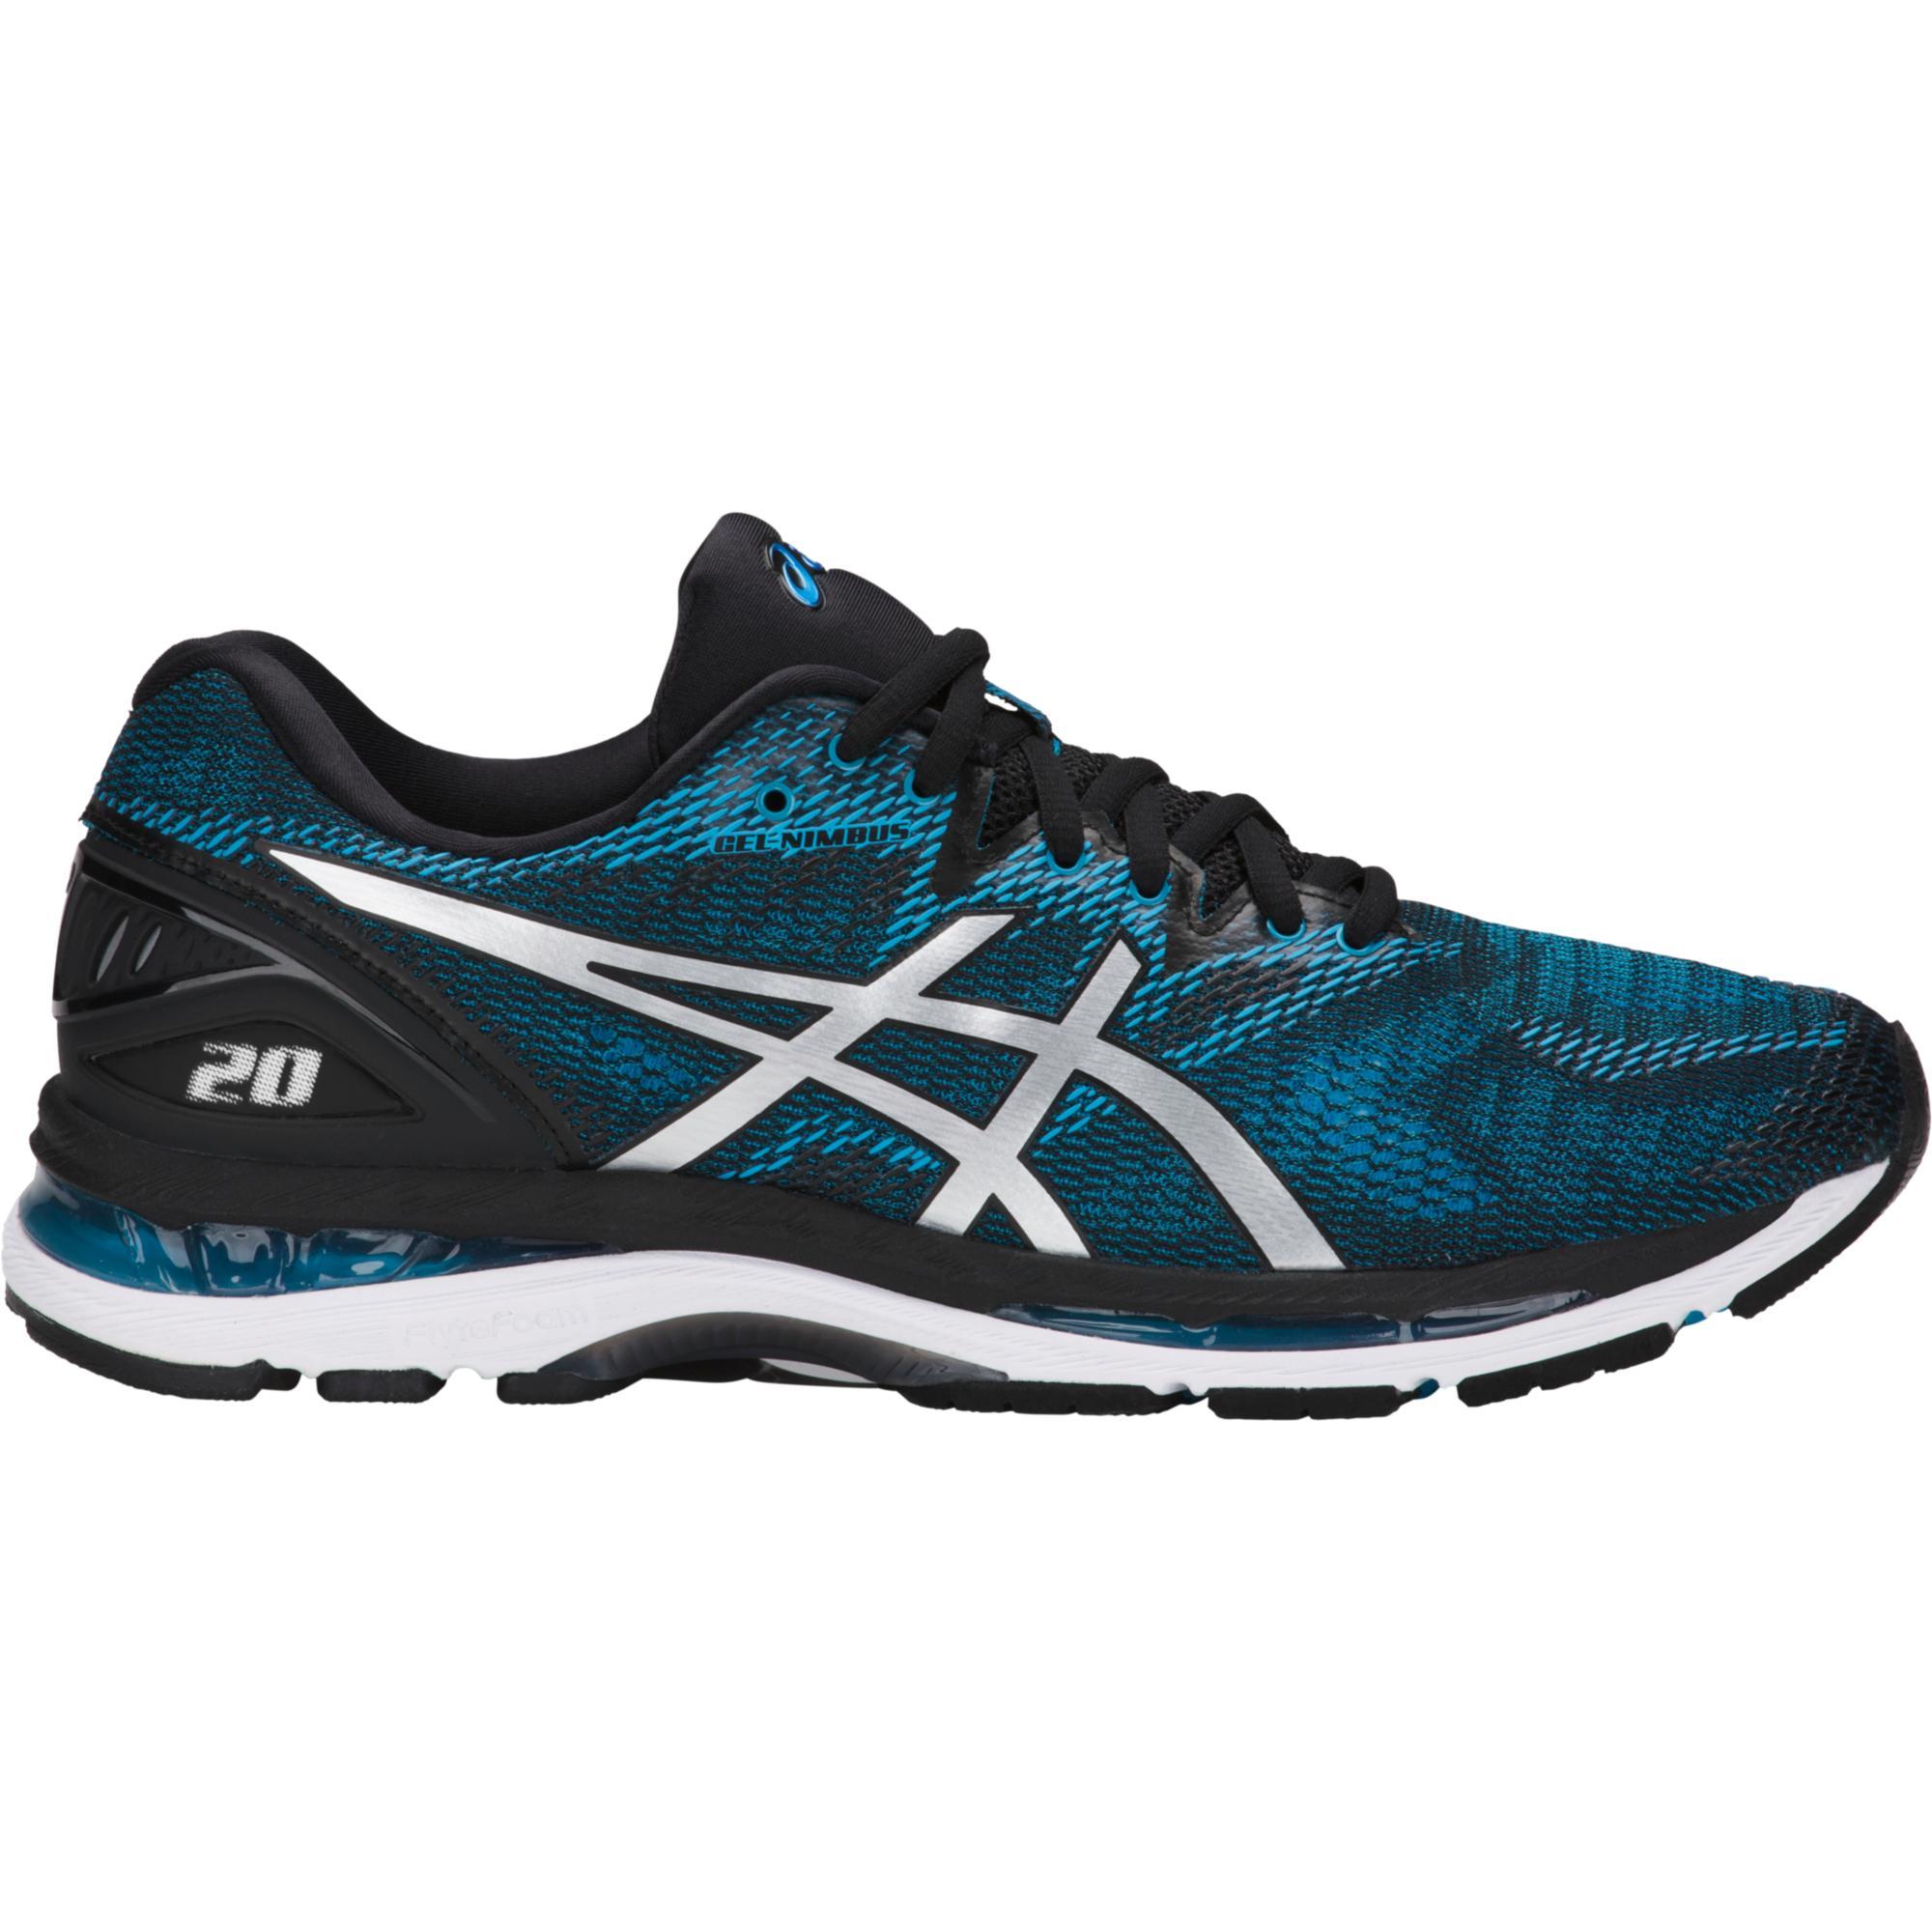 Asics Mens Gel Nimbus 20 Running Shoes Island Blue Black